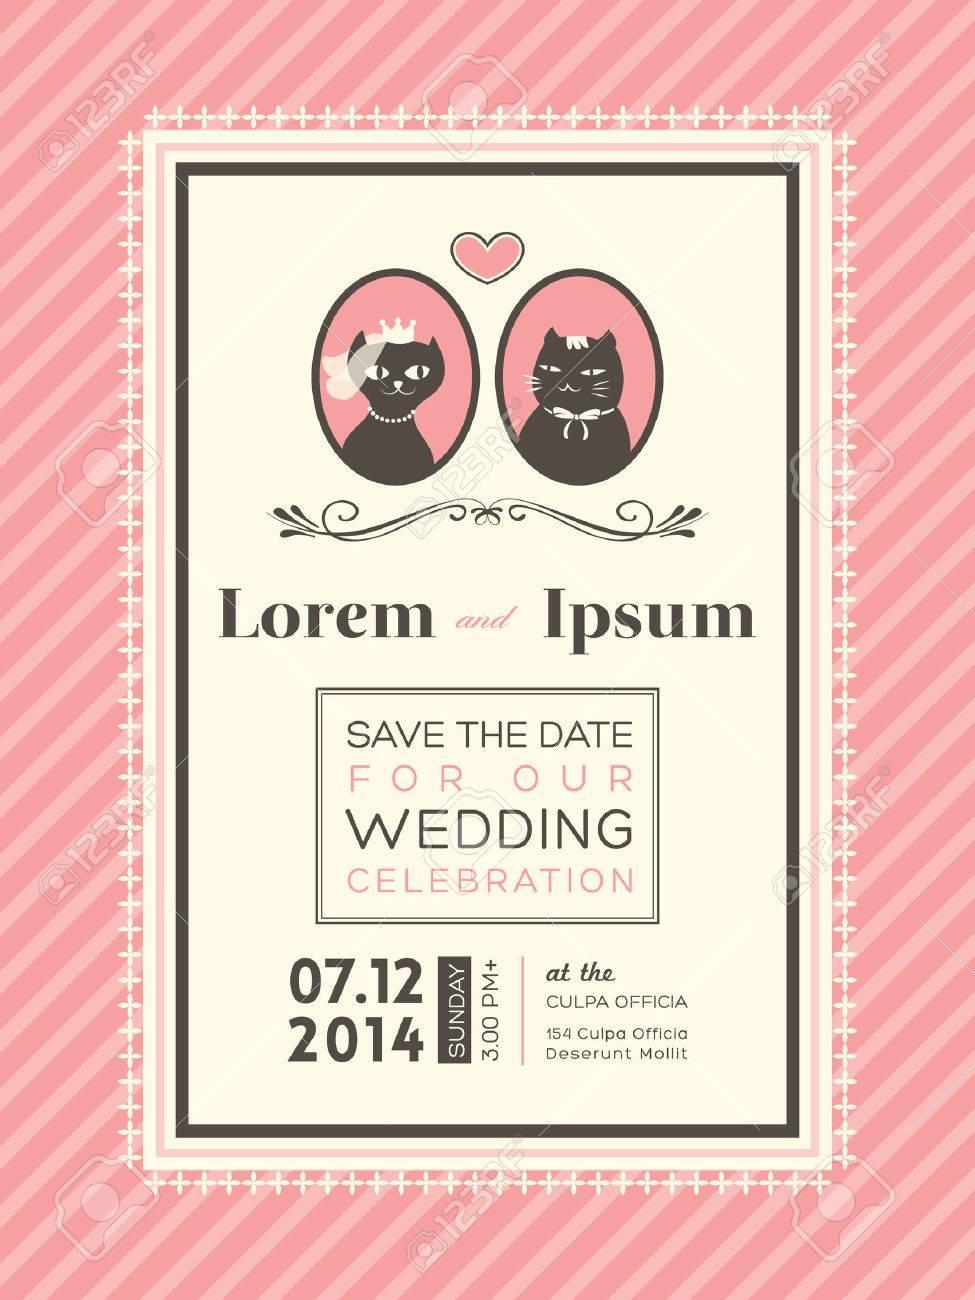 Cute Wedding Invitation Design Frame Template Royalty Free ...